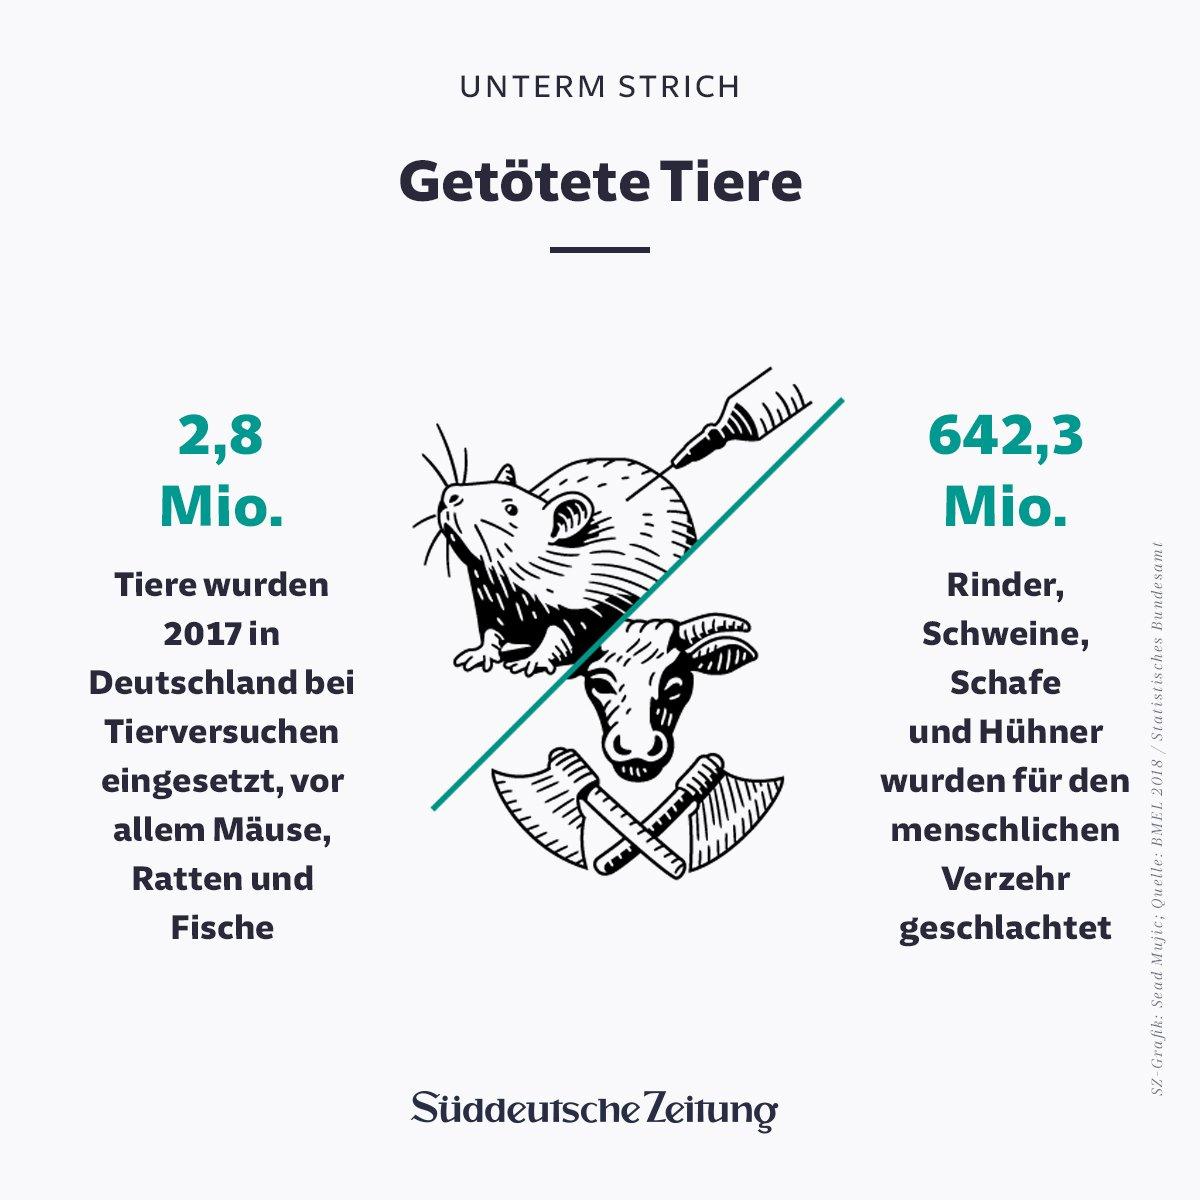 Süddeutsche Zeitung en Twitter: